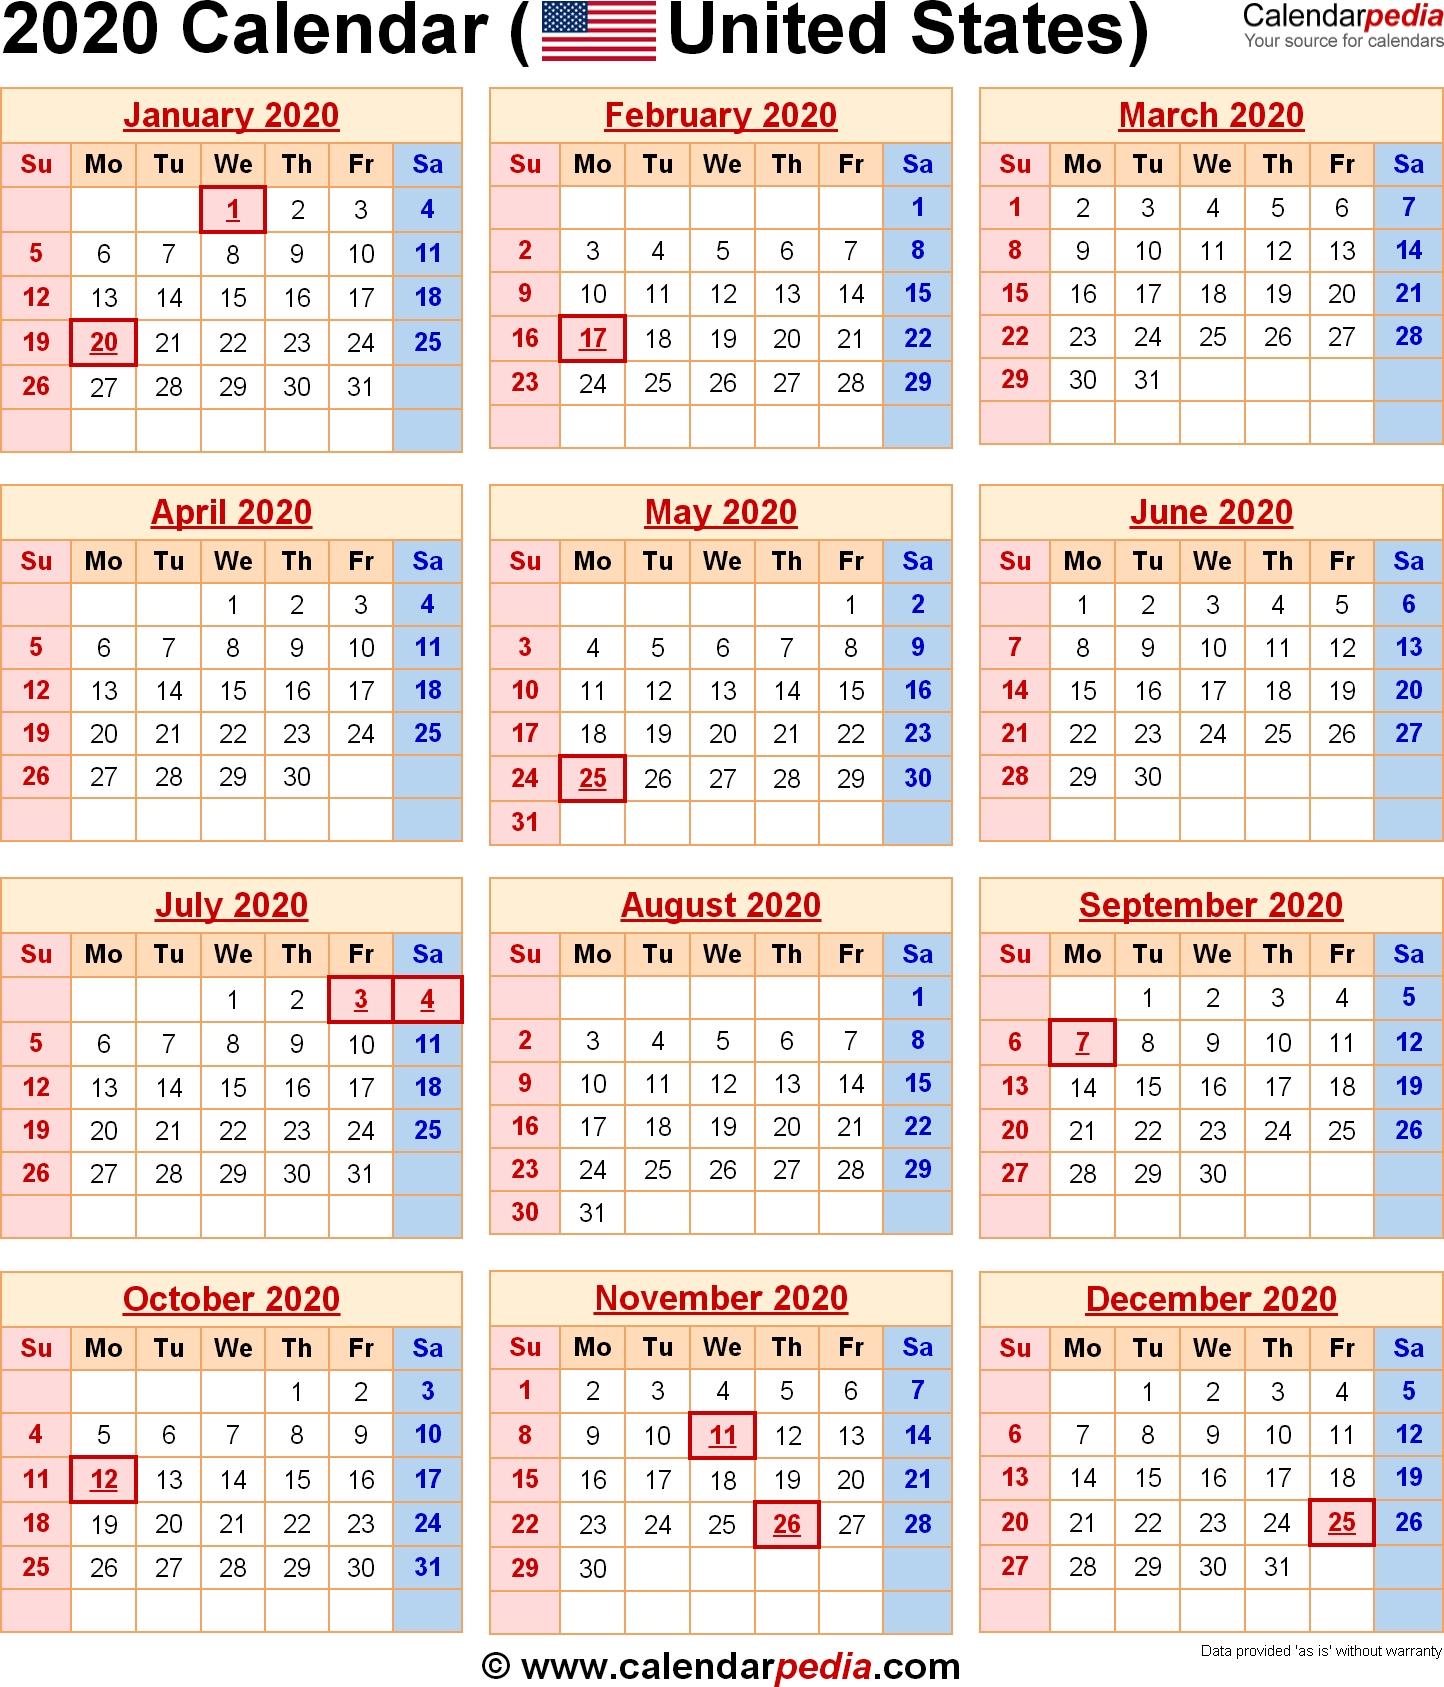 2020 Calendar With Federal Holidays